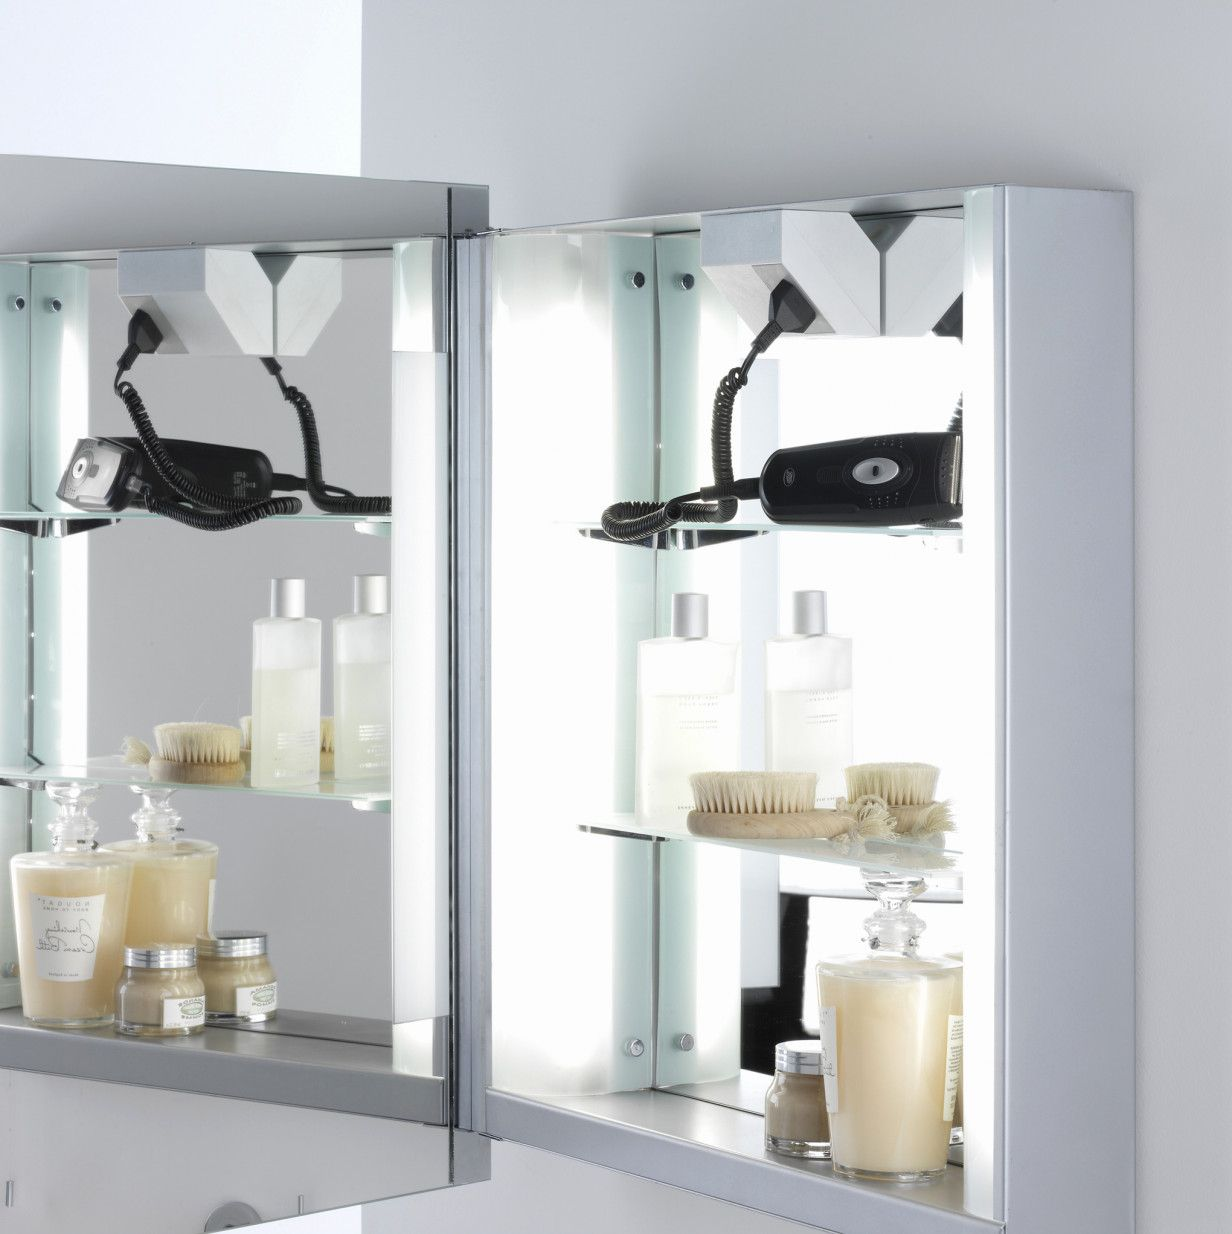 2018 Illuminated Bathroom Mirror Cabinet with Shaver socket ...